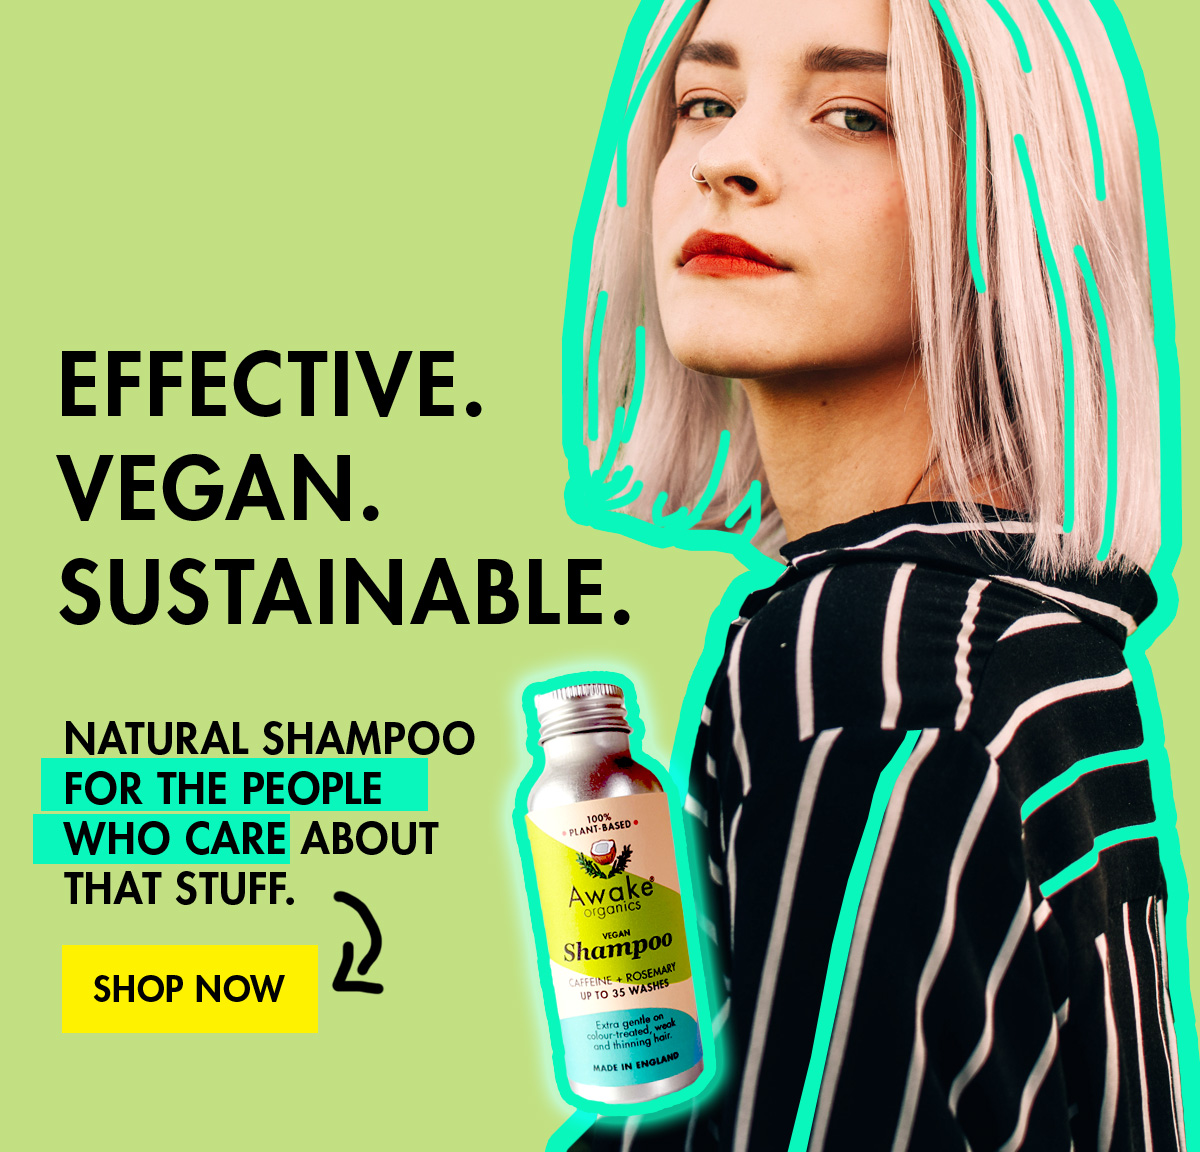 Plastic free shampoo natural vegan no sls with caffeine and rosemary by awake organics-free-shampoo-natural-vegan-no-sls-with-caffeine-and-rosemary-by-awake-organics main image